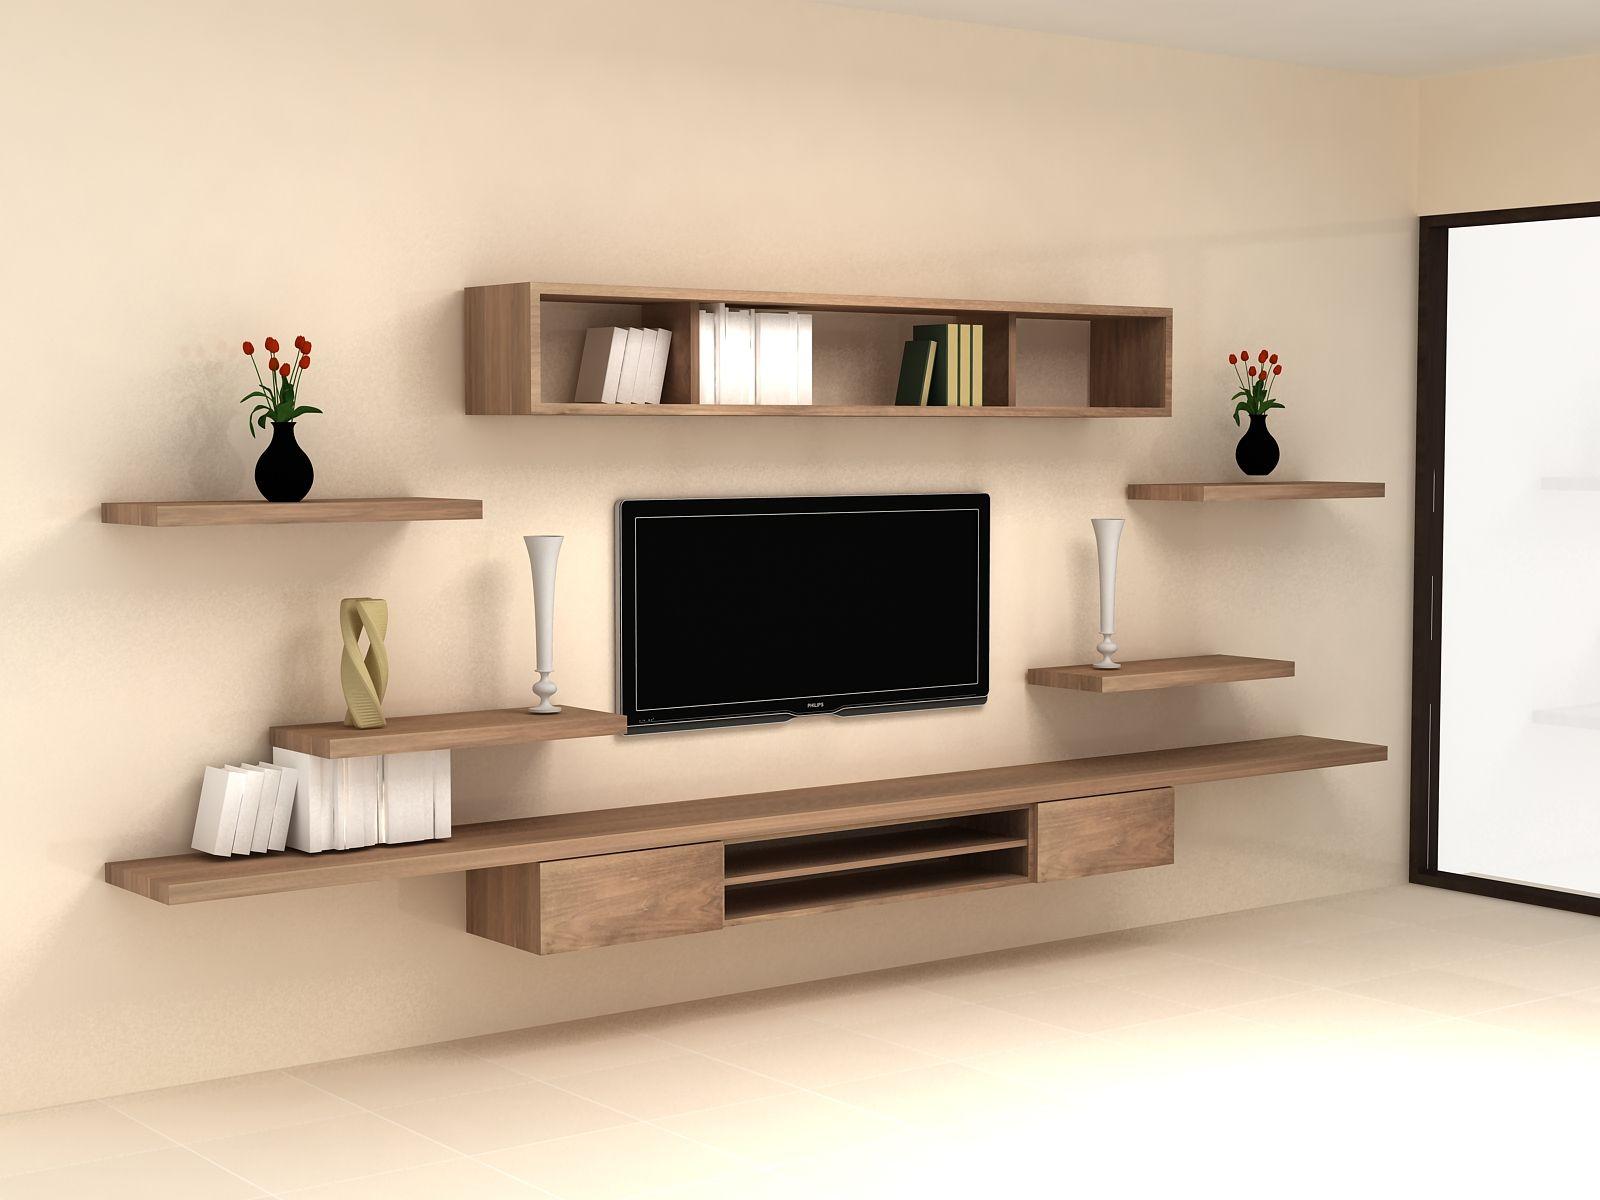 wall hung tv cabinet 1  mozaik furniture  Pinterest  Tv